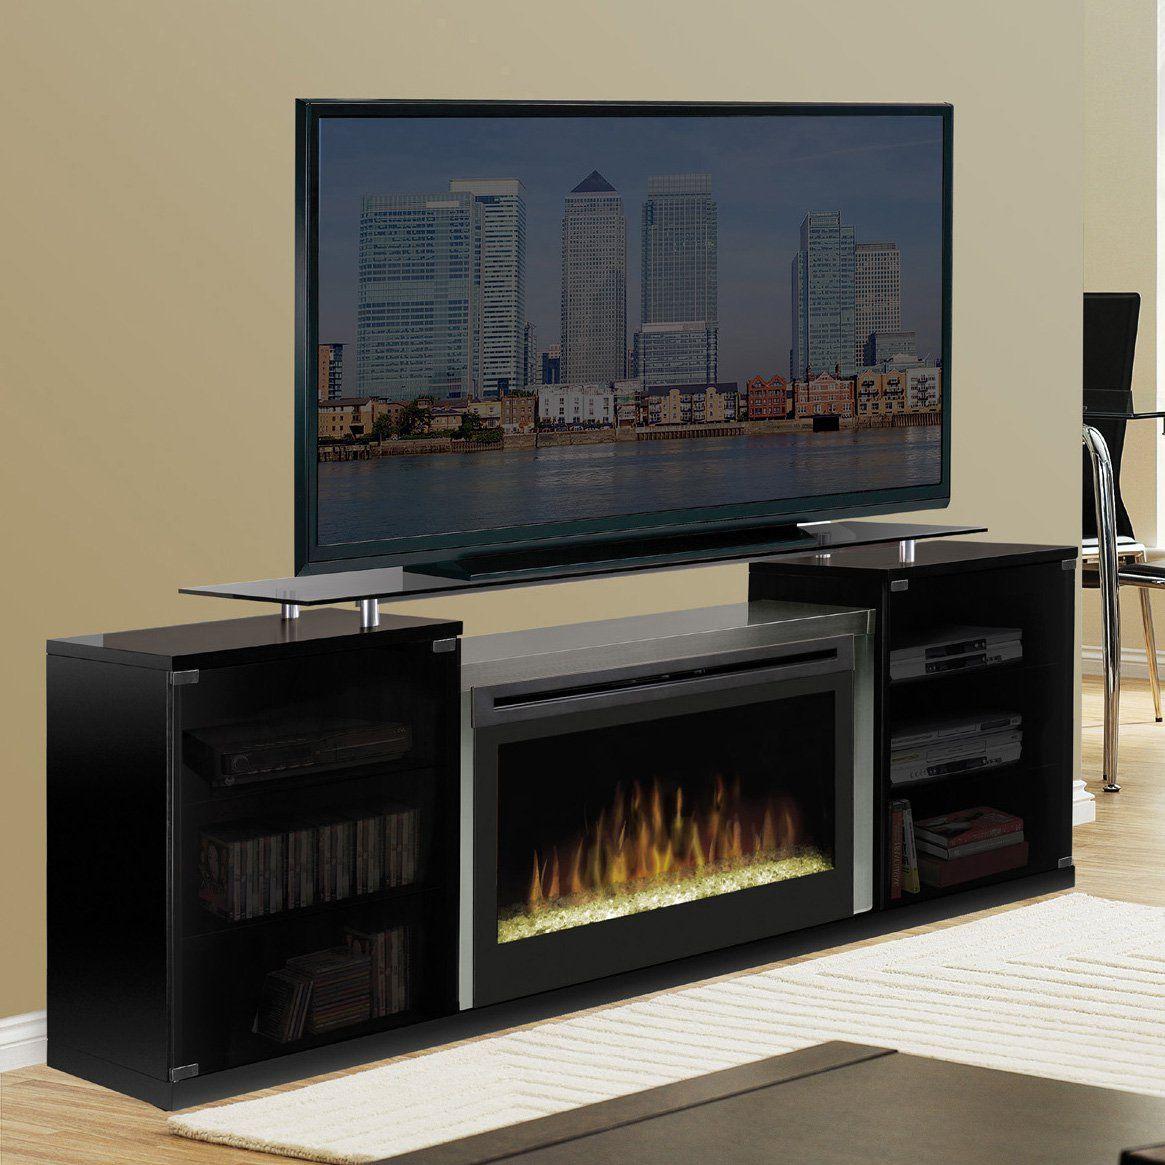 Dimplex Marana Black Entertainment Center Electric Fireplace